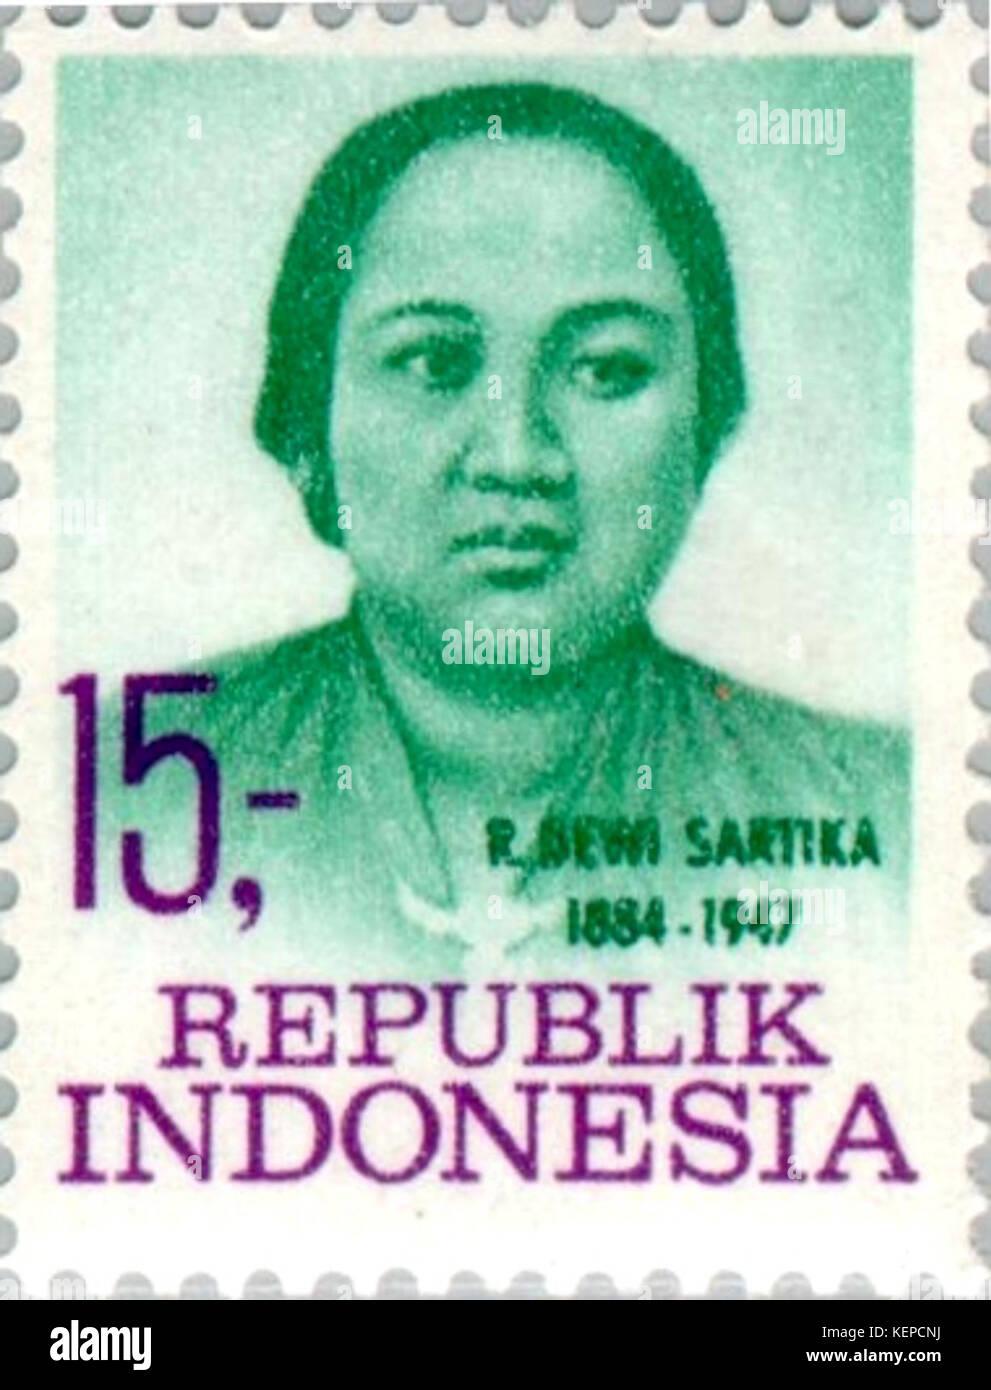 Dewi Sartika 1969 Indonesia Stamp Stock Photo: 163991454 - Alamy